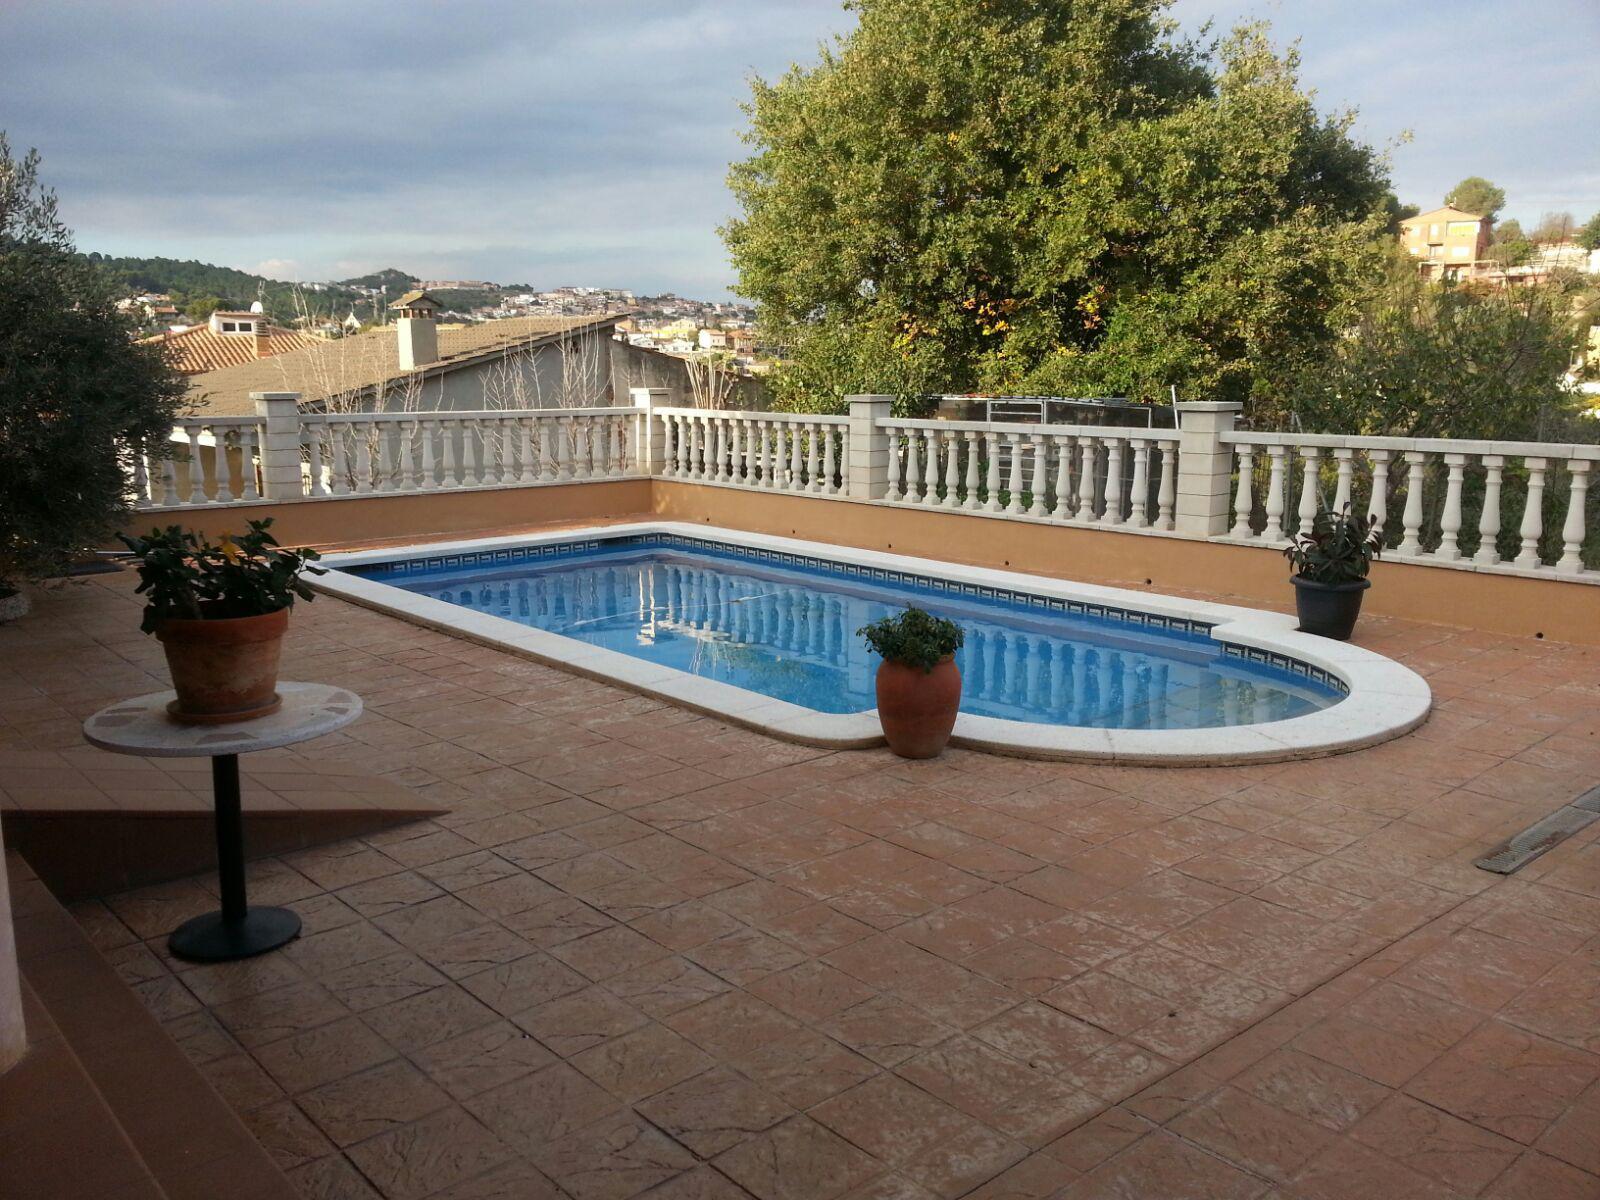 Piscina sant joan despi beautiful kenburns with piscina for Piscina can mercader